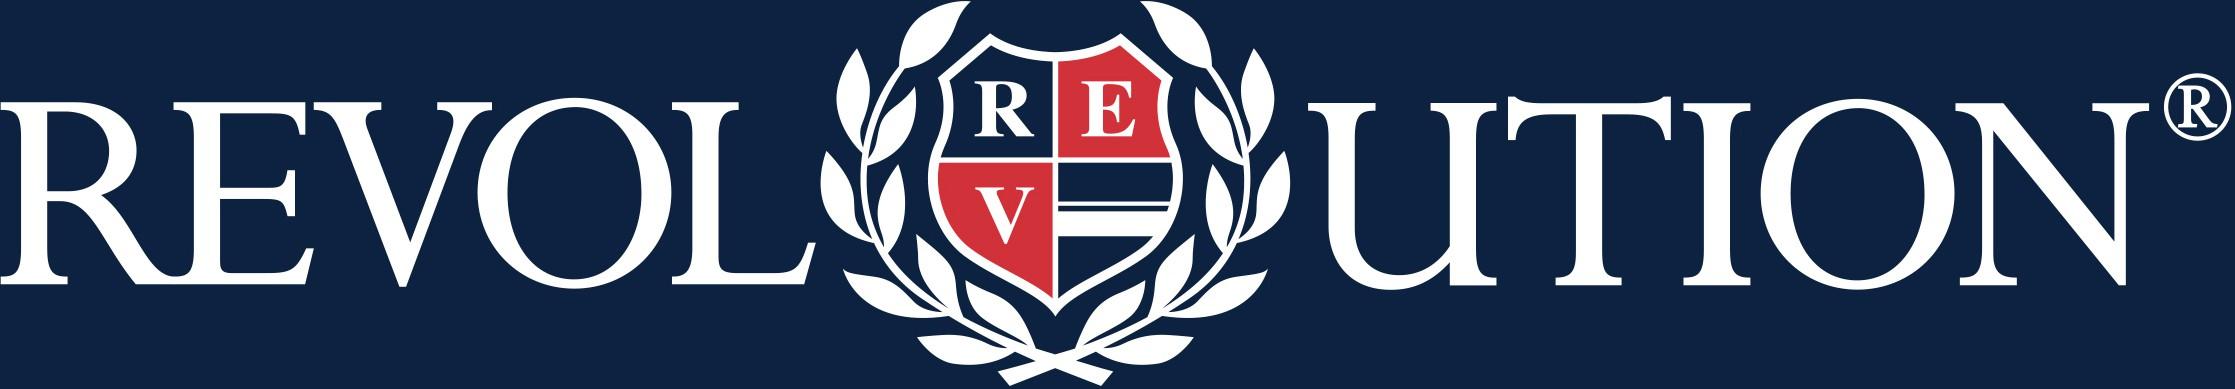 padel-revolution-logo_mobile-1478456110